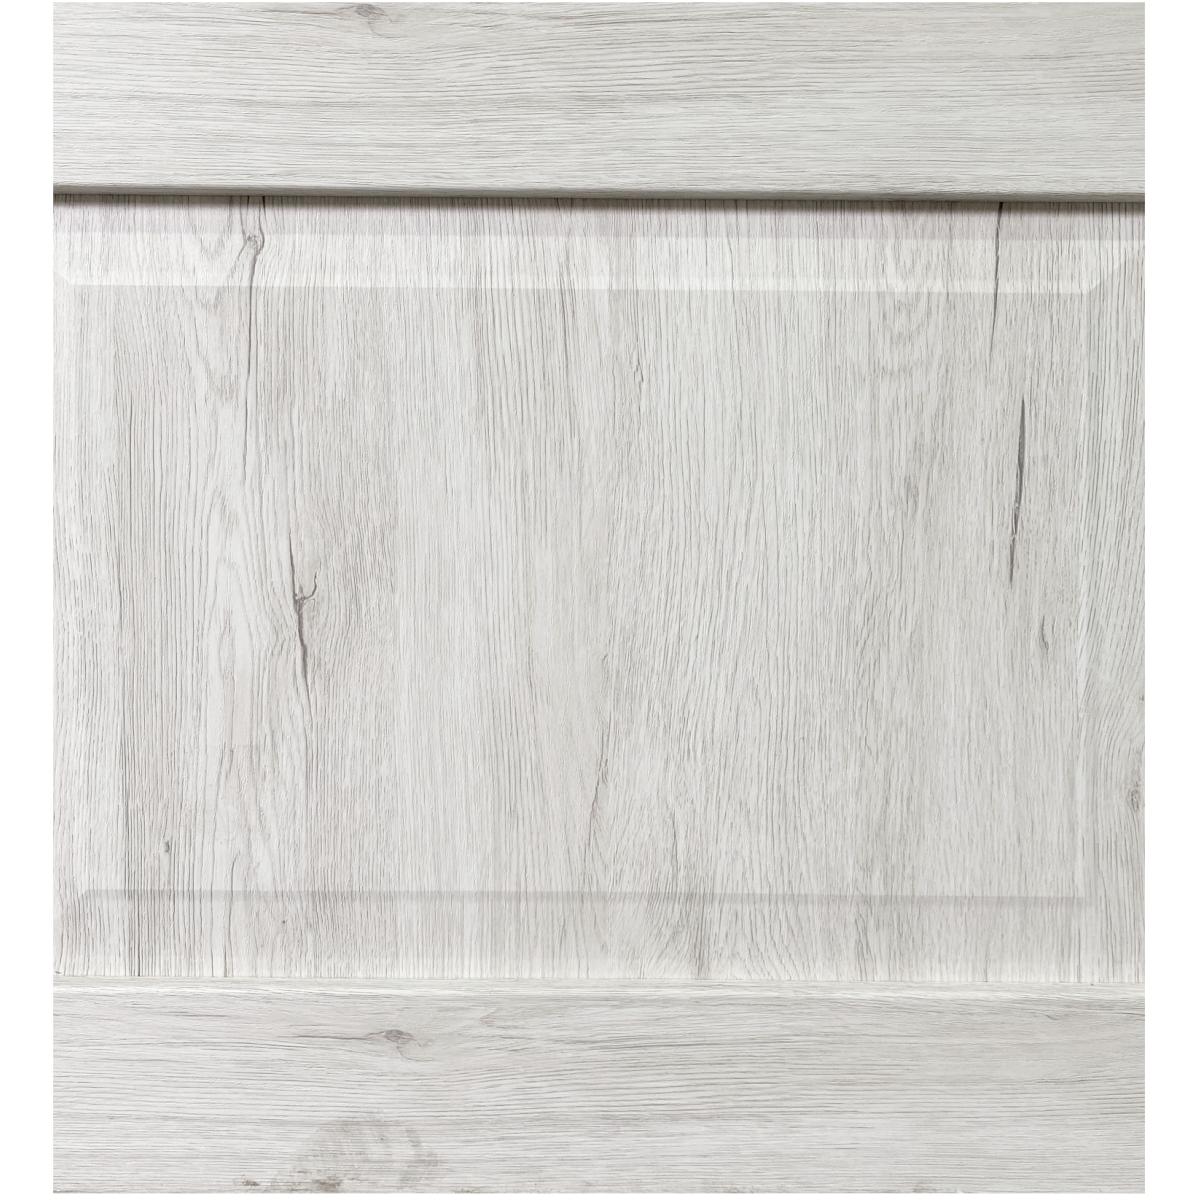 Дверь Межкомнатная Остеклённая Амелия 70Х200 С Фурнитурой Пвх Цвет Рустик Серый